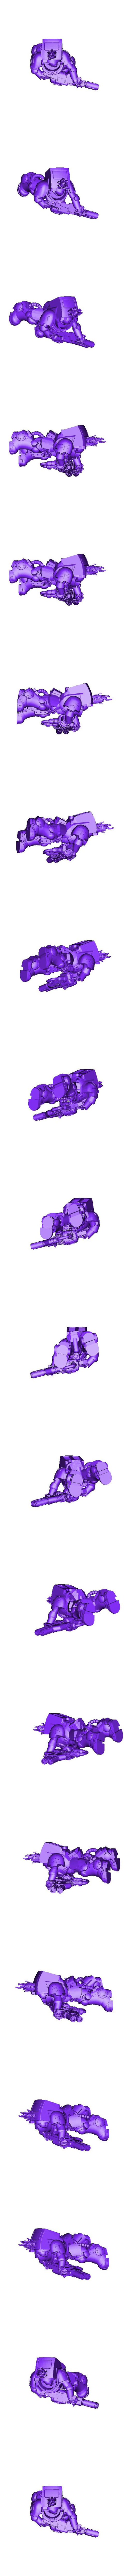 Dark Crusader Heavy Infantry Liquidators - 04 - Heavy.stl Download free STL file Dark Crusader Heavy Infantry Liquidator Squad • 3D printing design, GrimmTheMaker